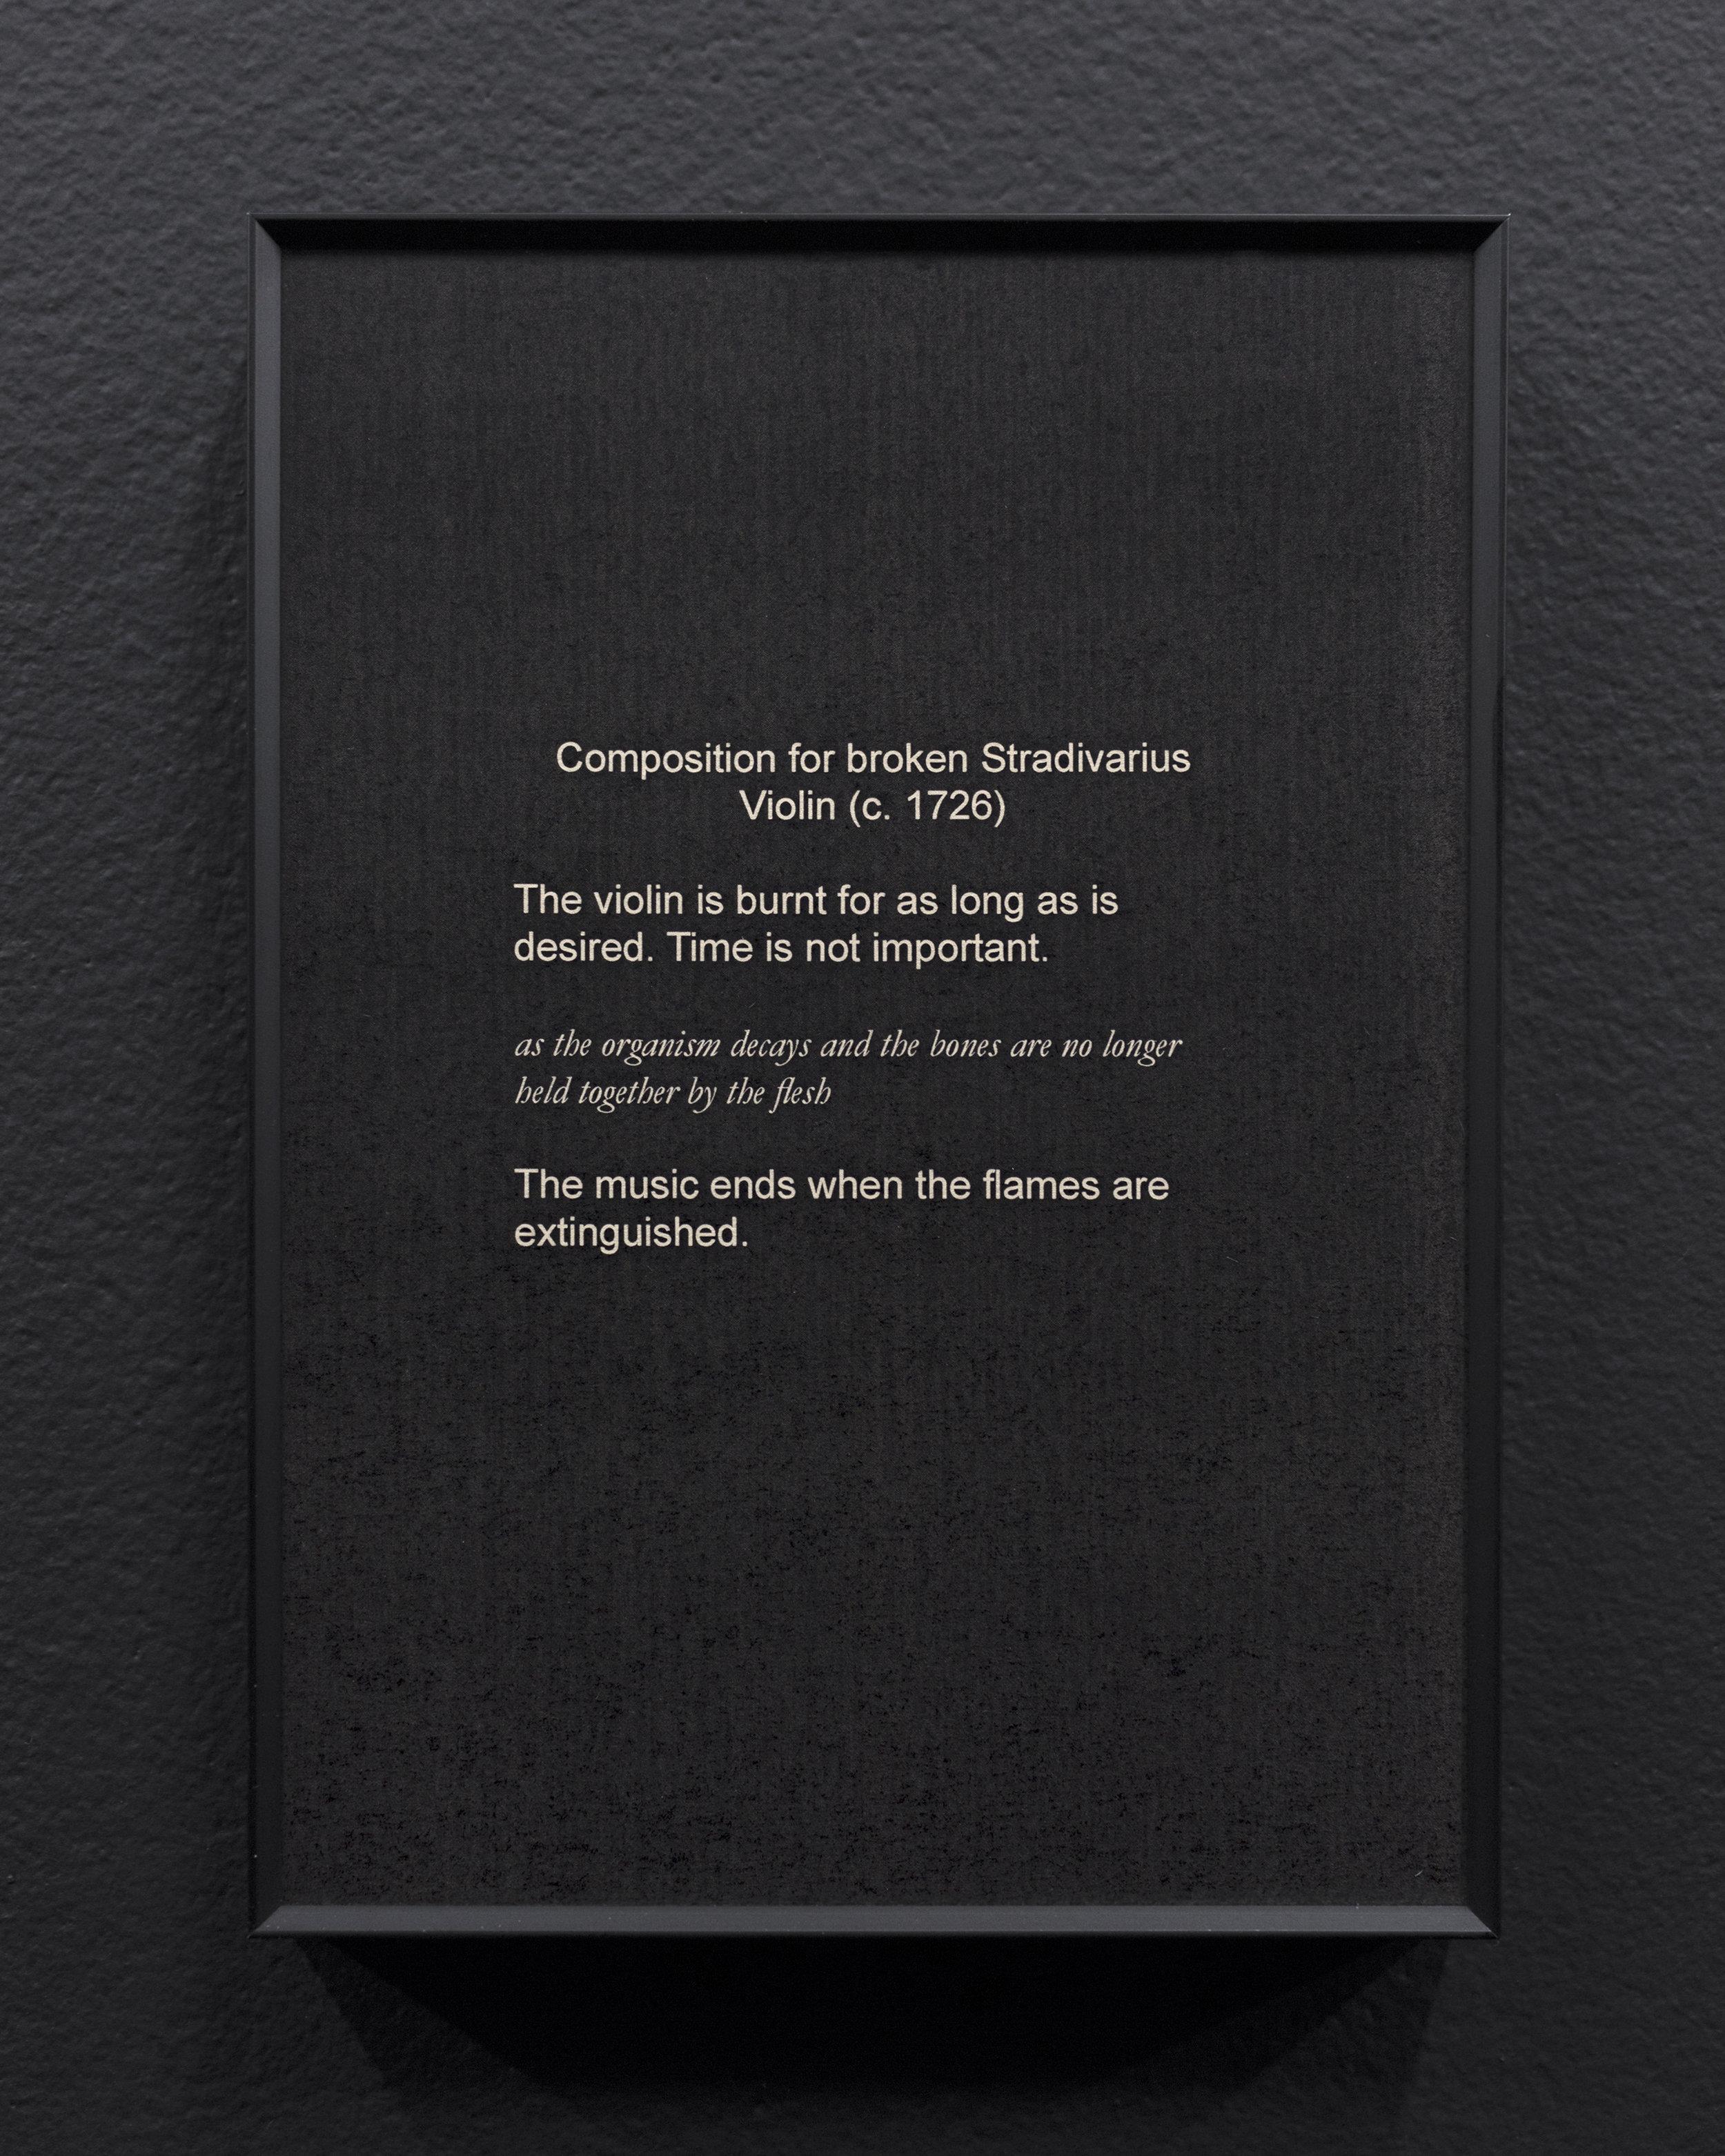 Micca Schippa,  Composition for broken Stradivarius Violin (C. 1726 ), Inkjet print on photo rag. 2018.